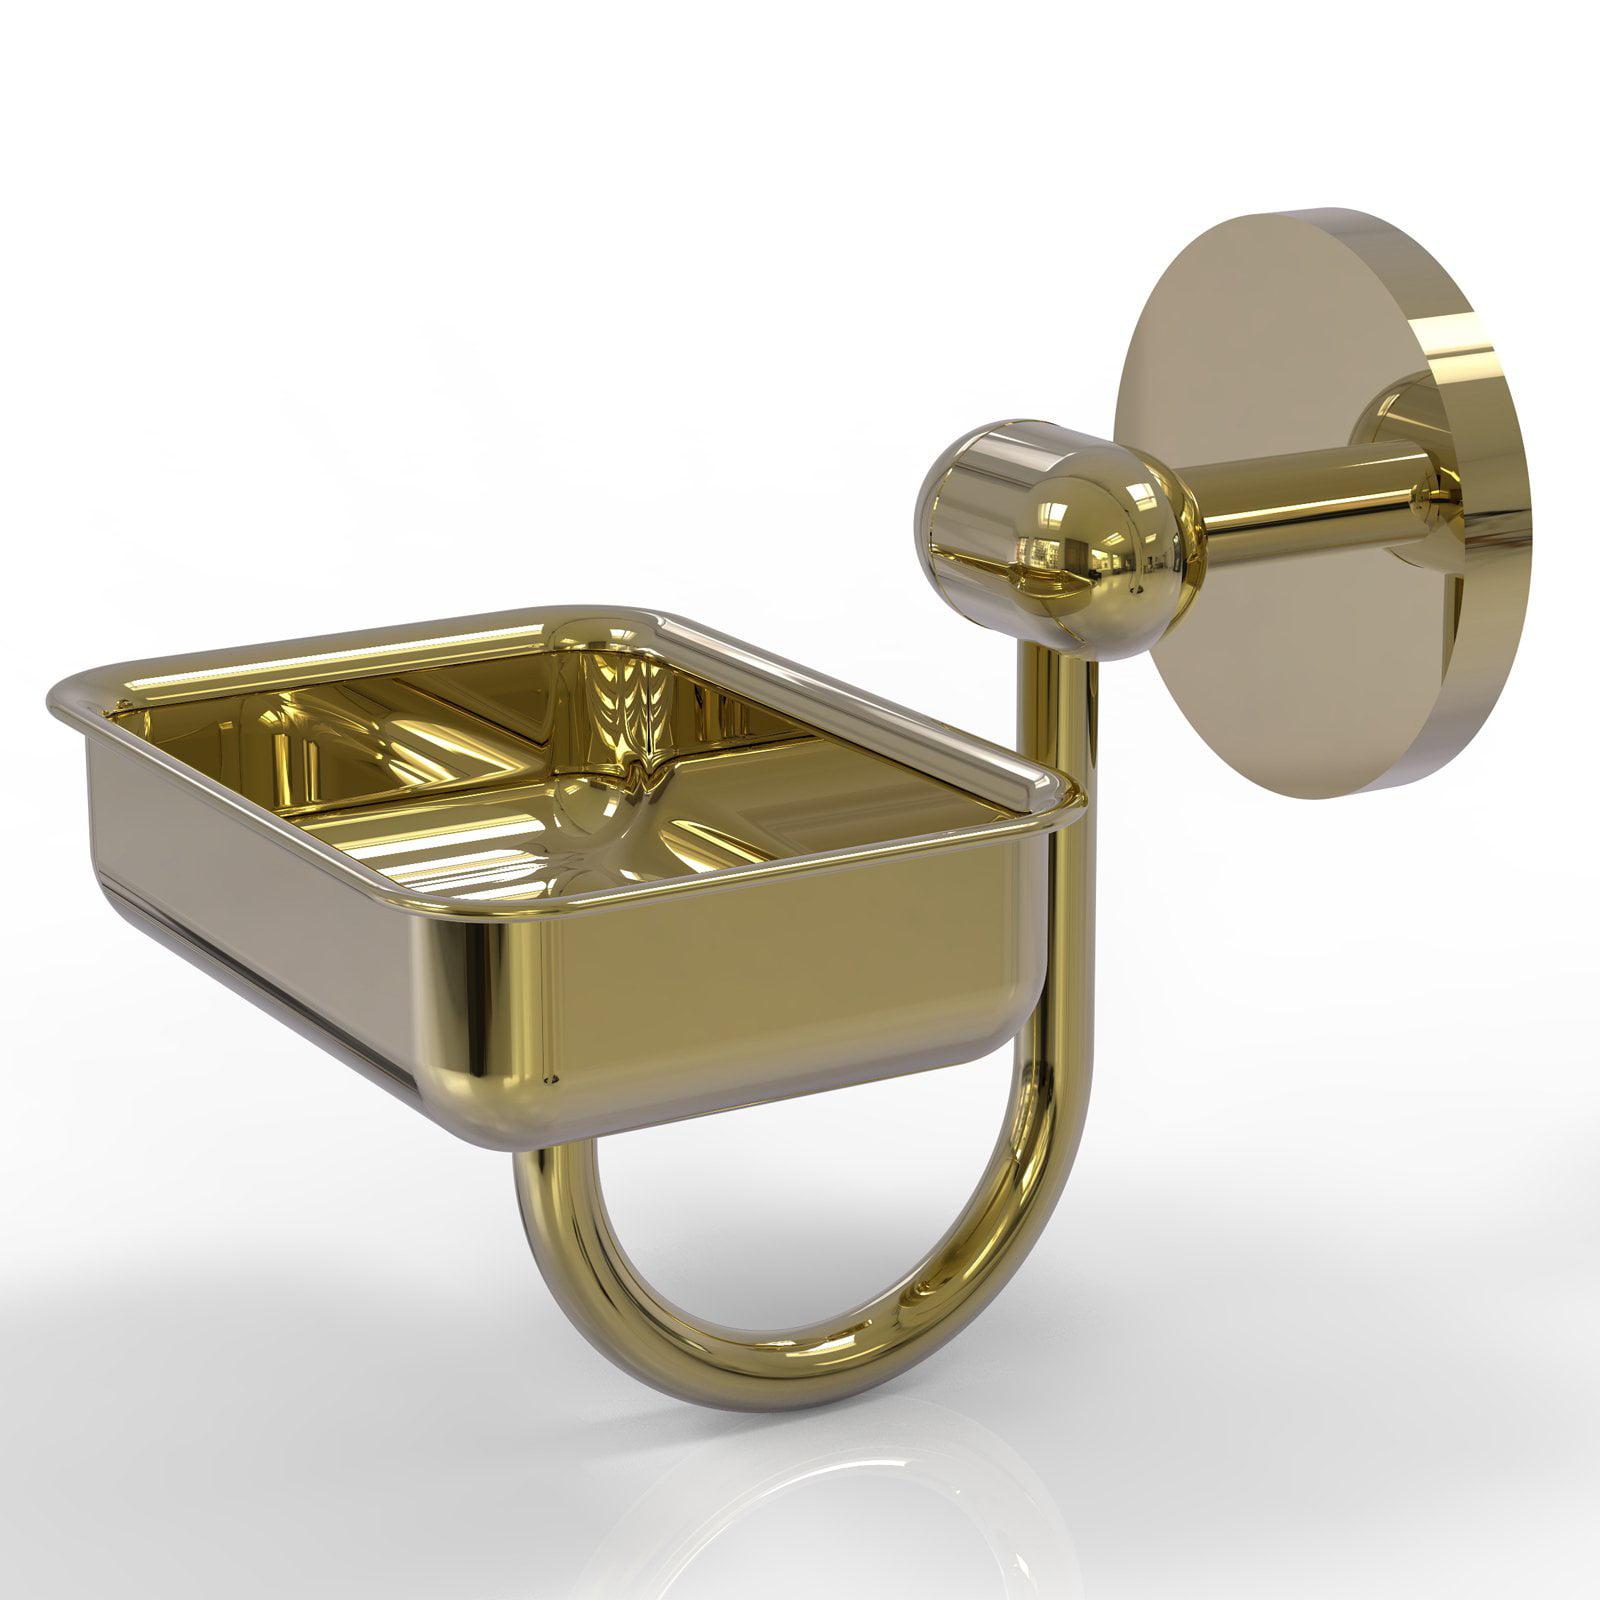 Allied Brass Tango Wall Mounted Soap Dish